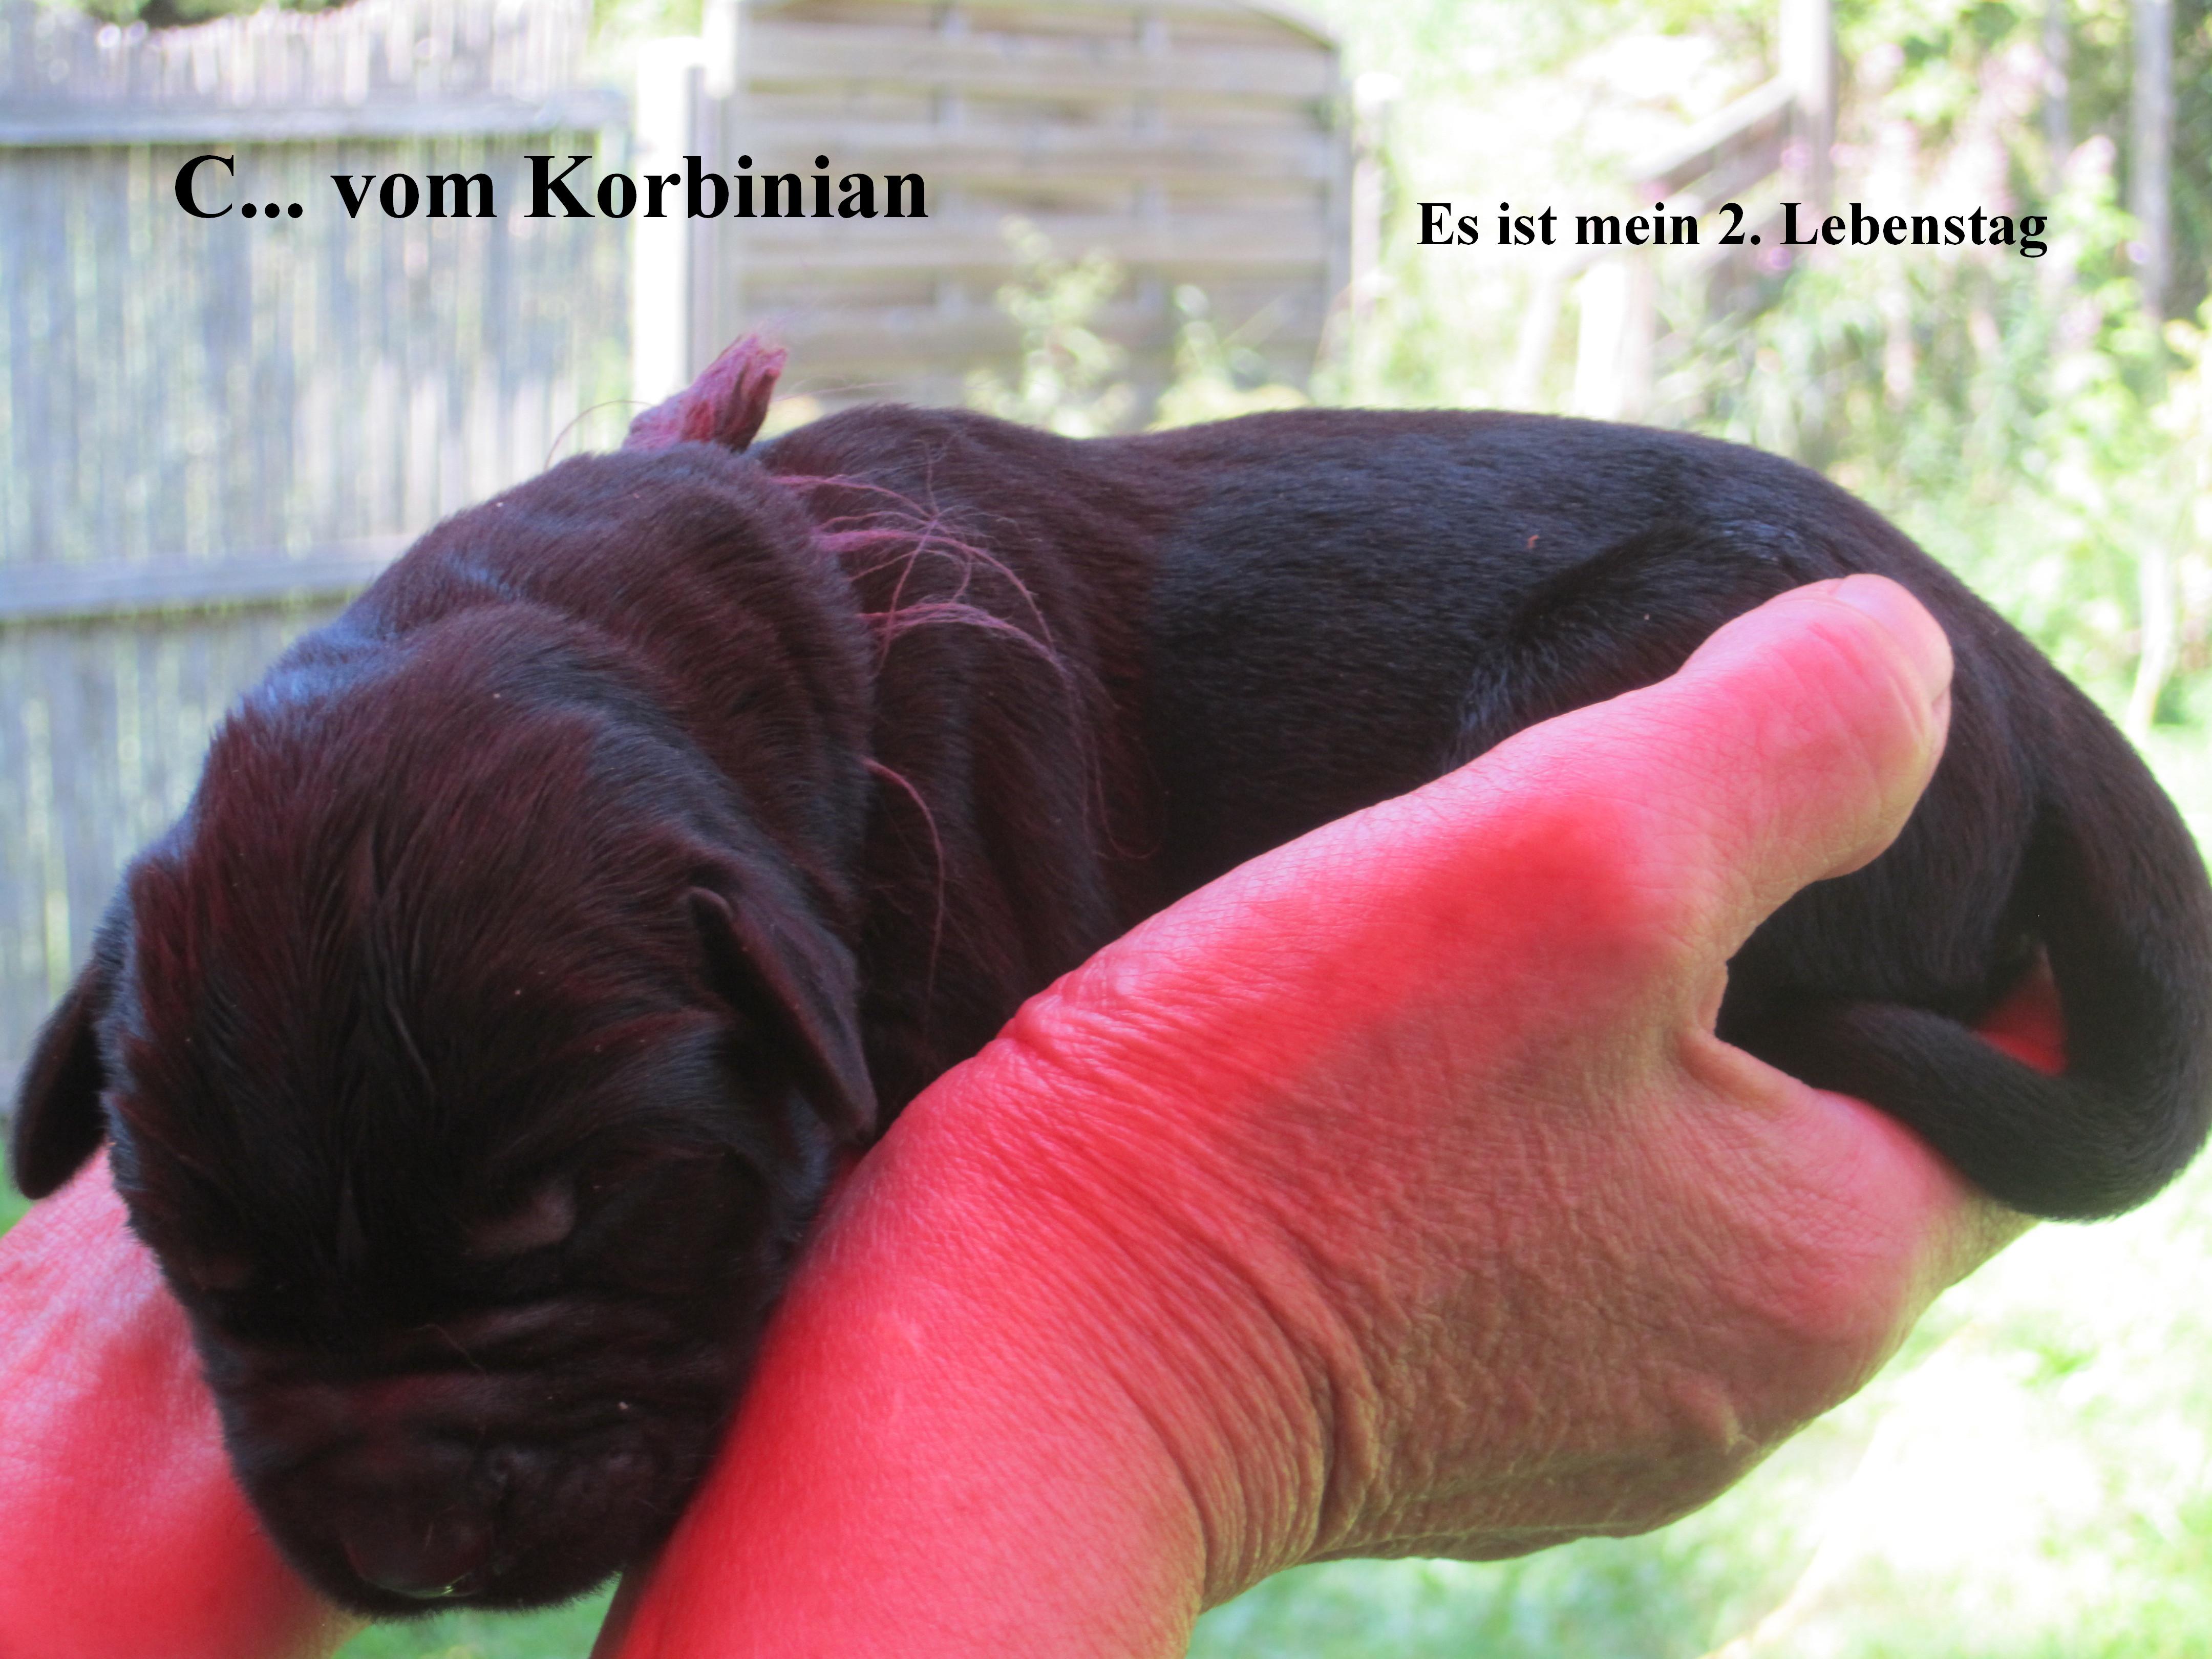 C vom Korbinian 09.08.2015